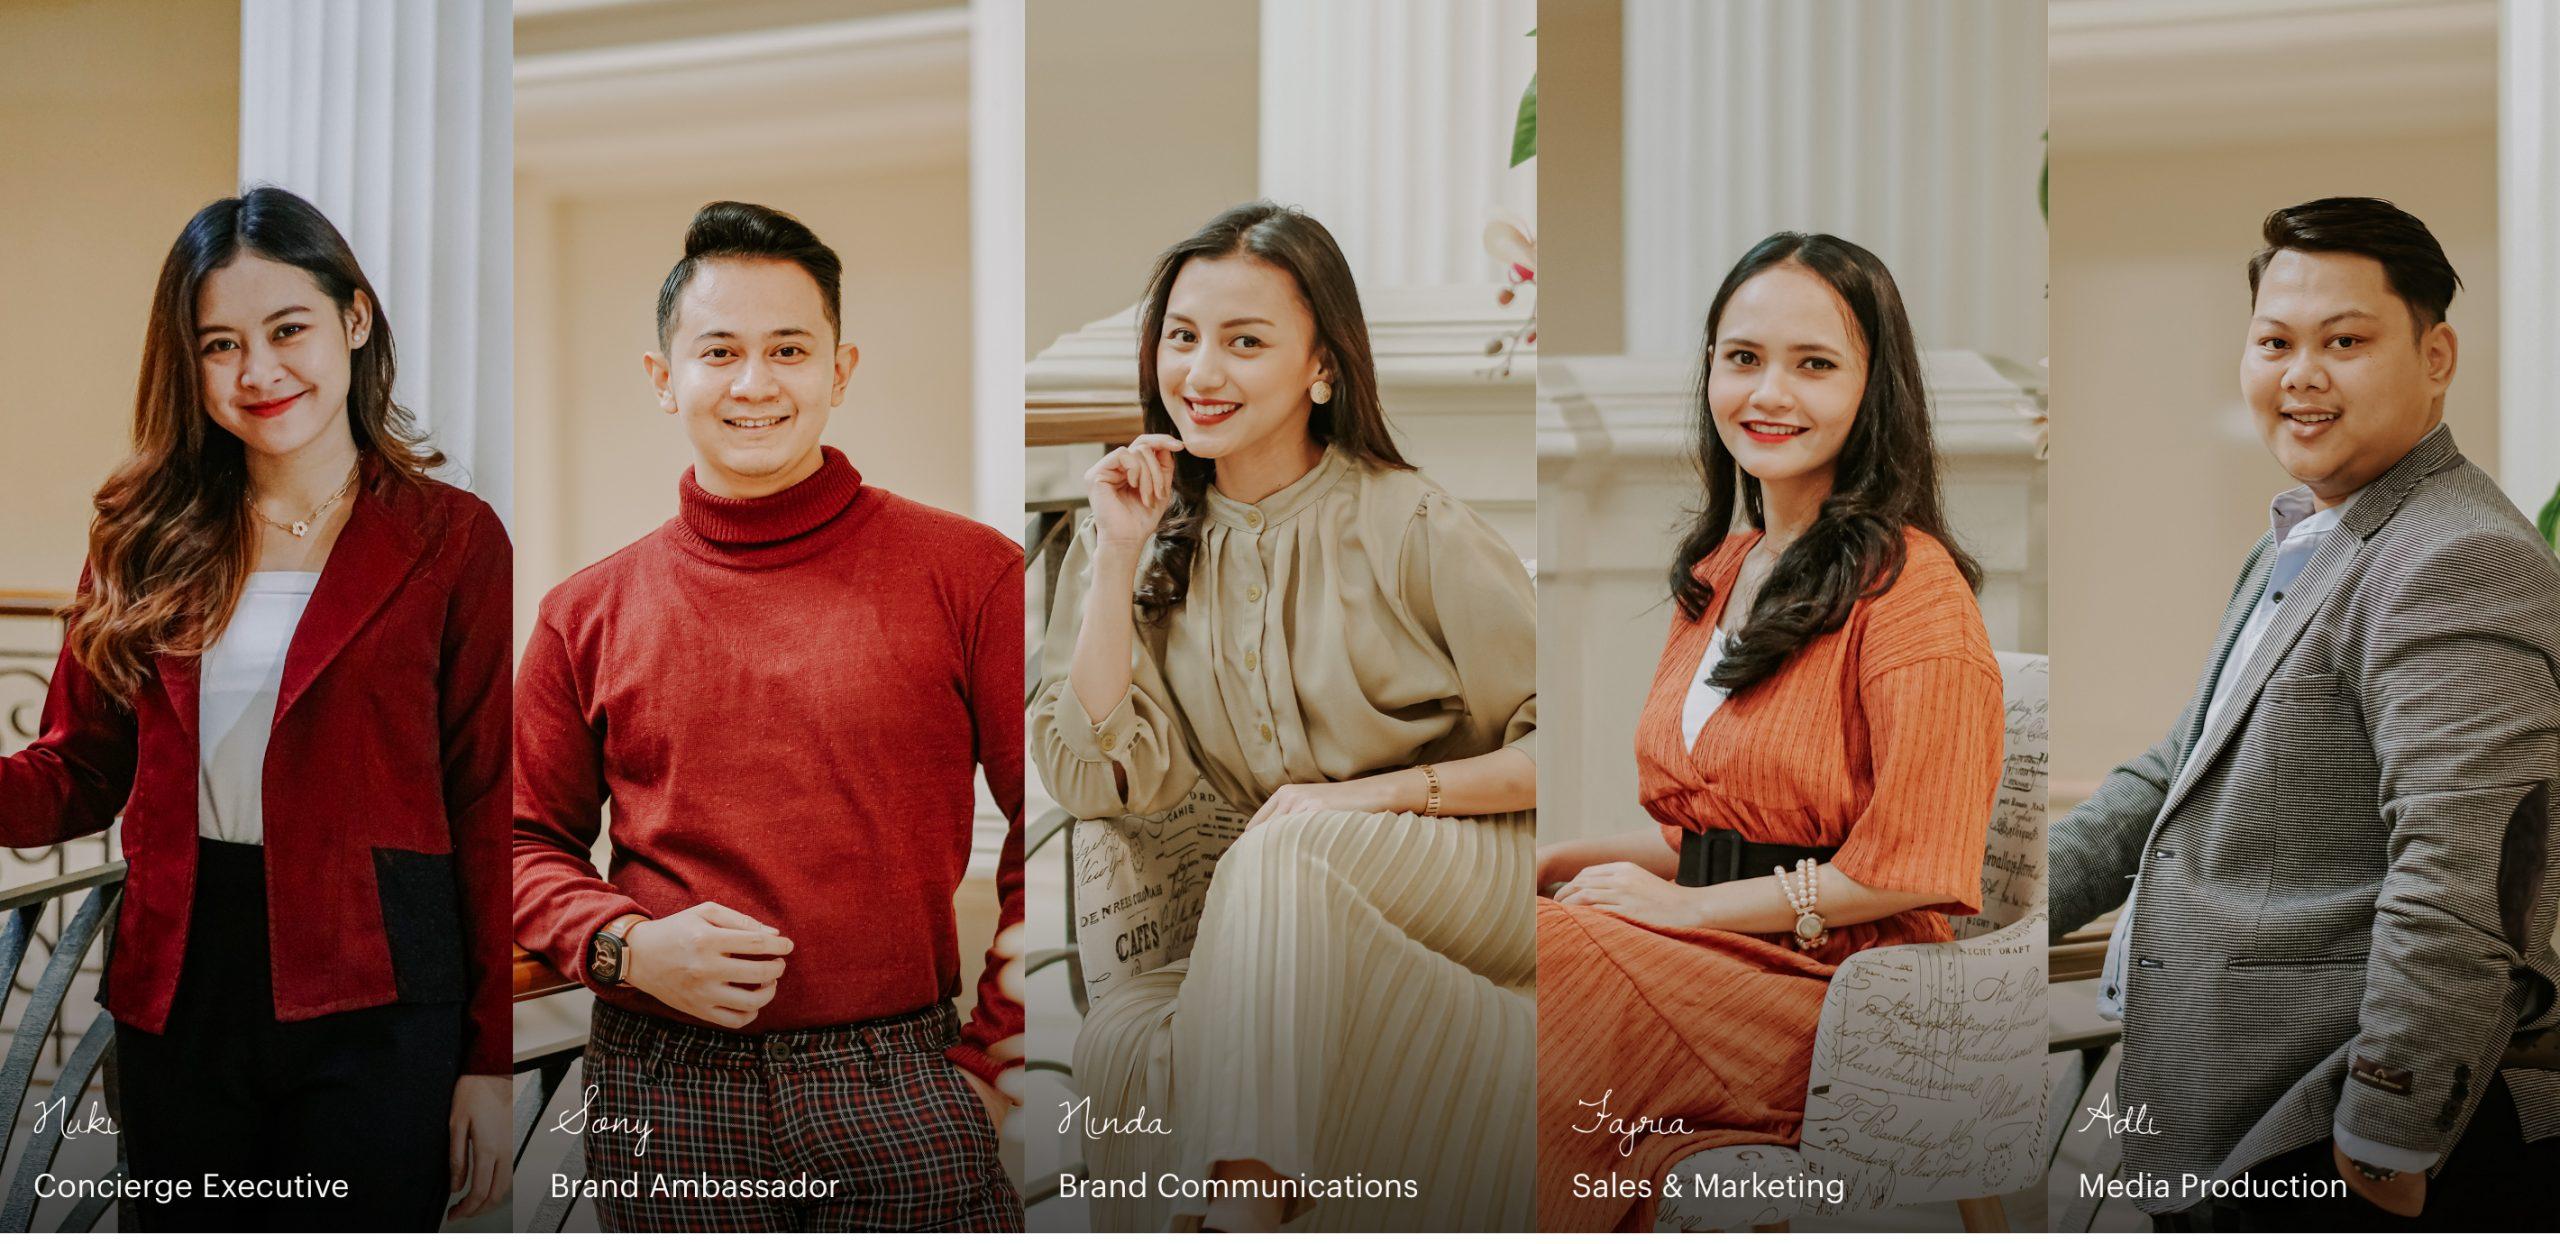 Brand and Communications - Tiara Hana Indonesia